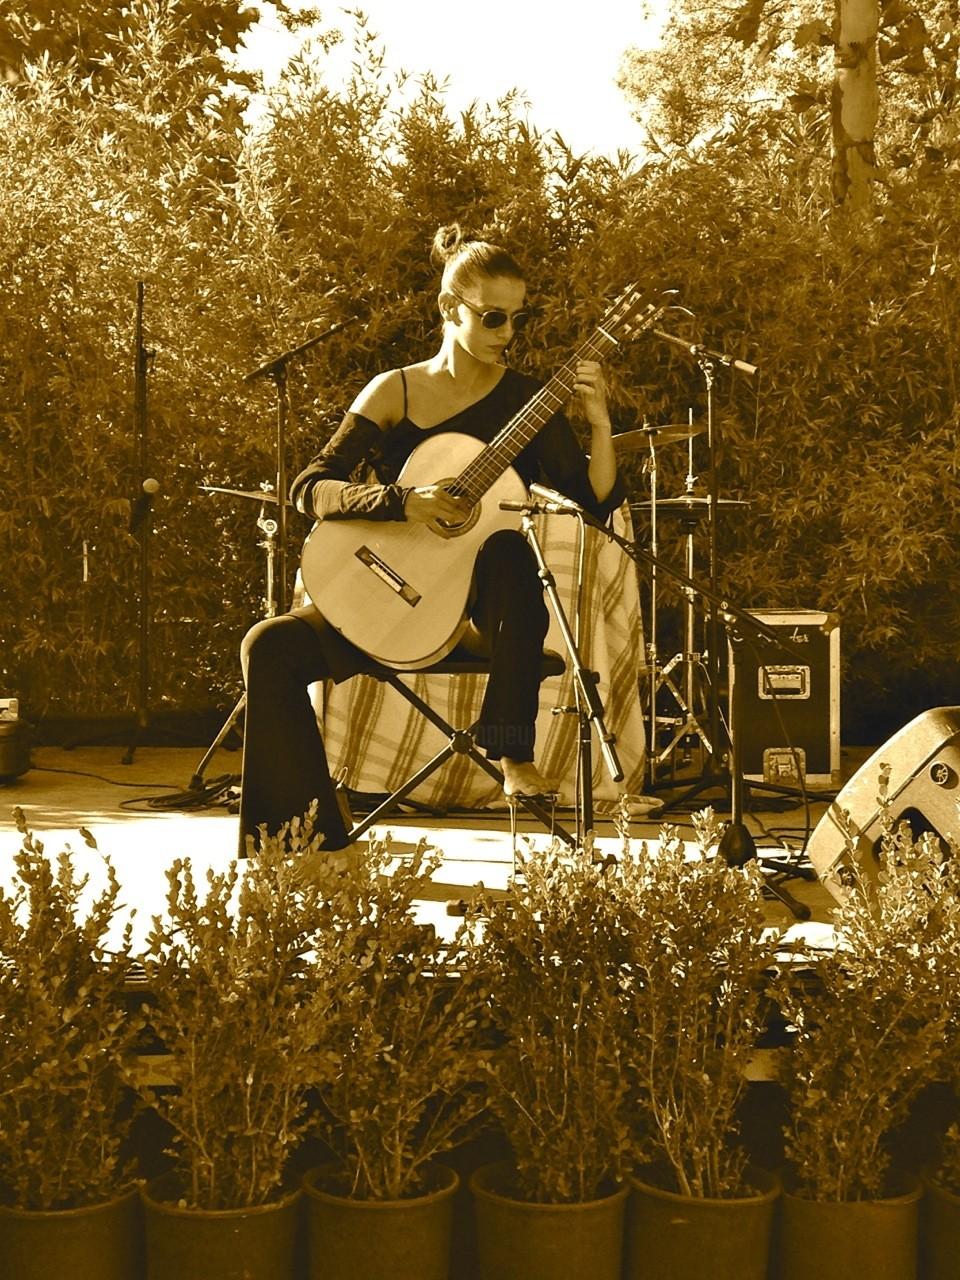 carmen martinez - Concert Salon de Jardin, pepinerie Derbez, Saint Tropez